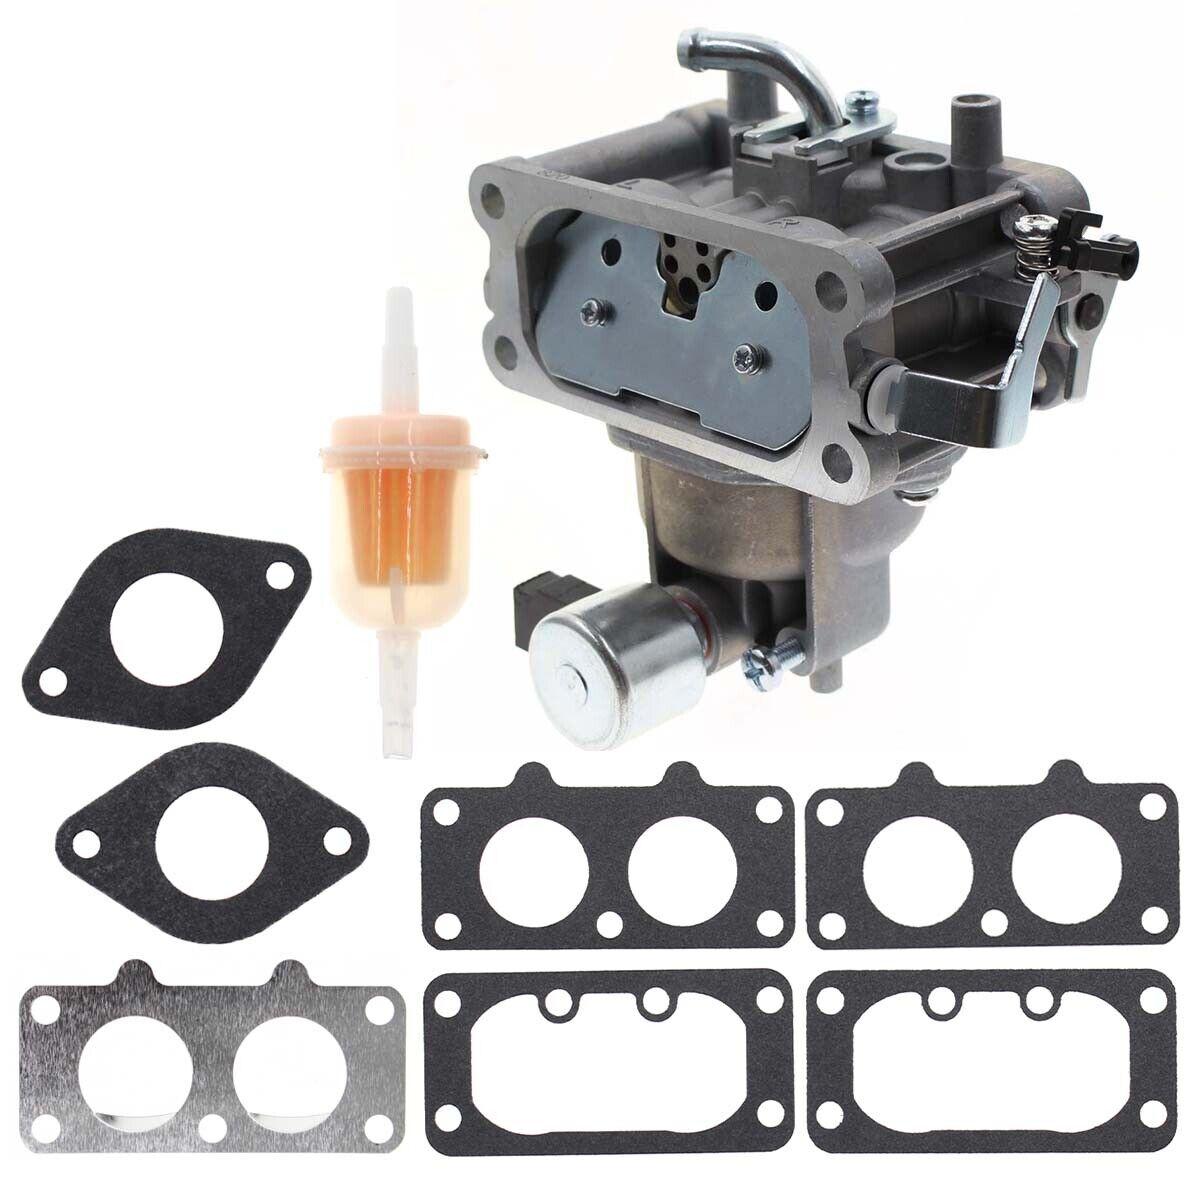 15004-1025 15004-0950 Fits FX730V Carburetor For Kawasaki  Engines Carb NEW